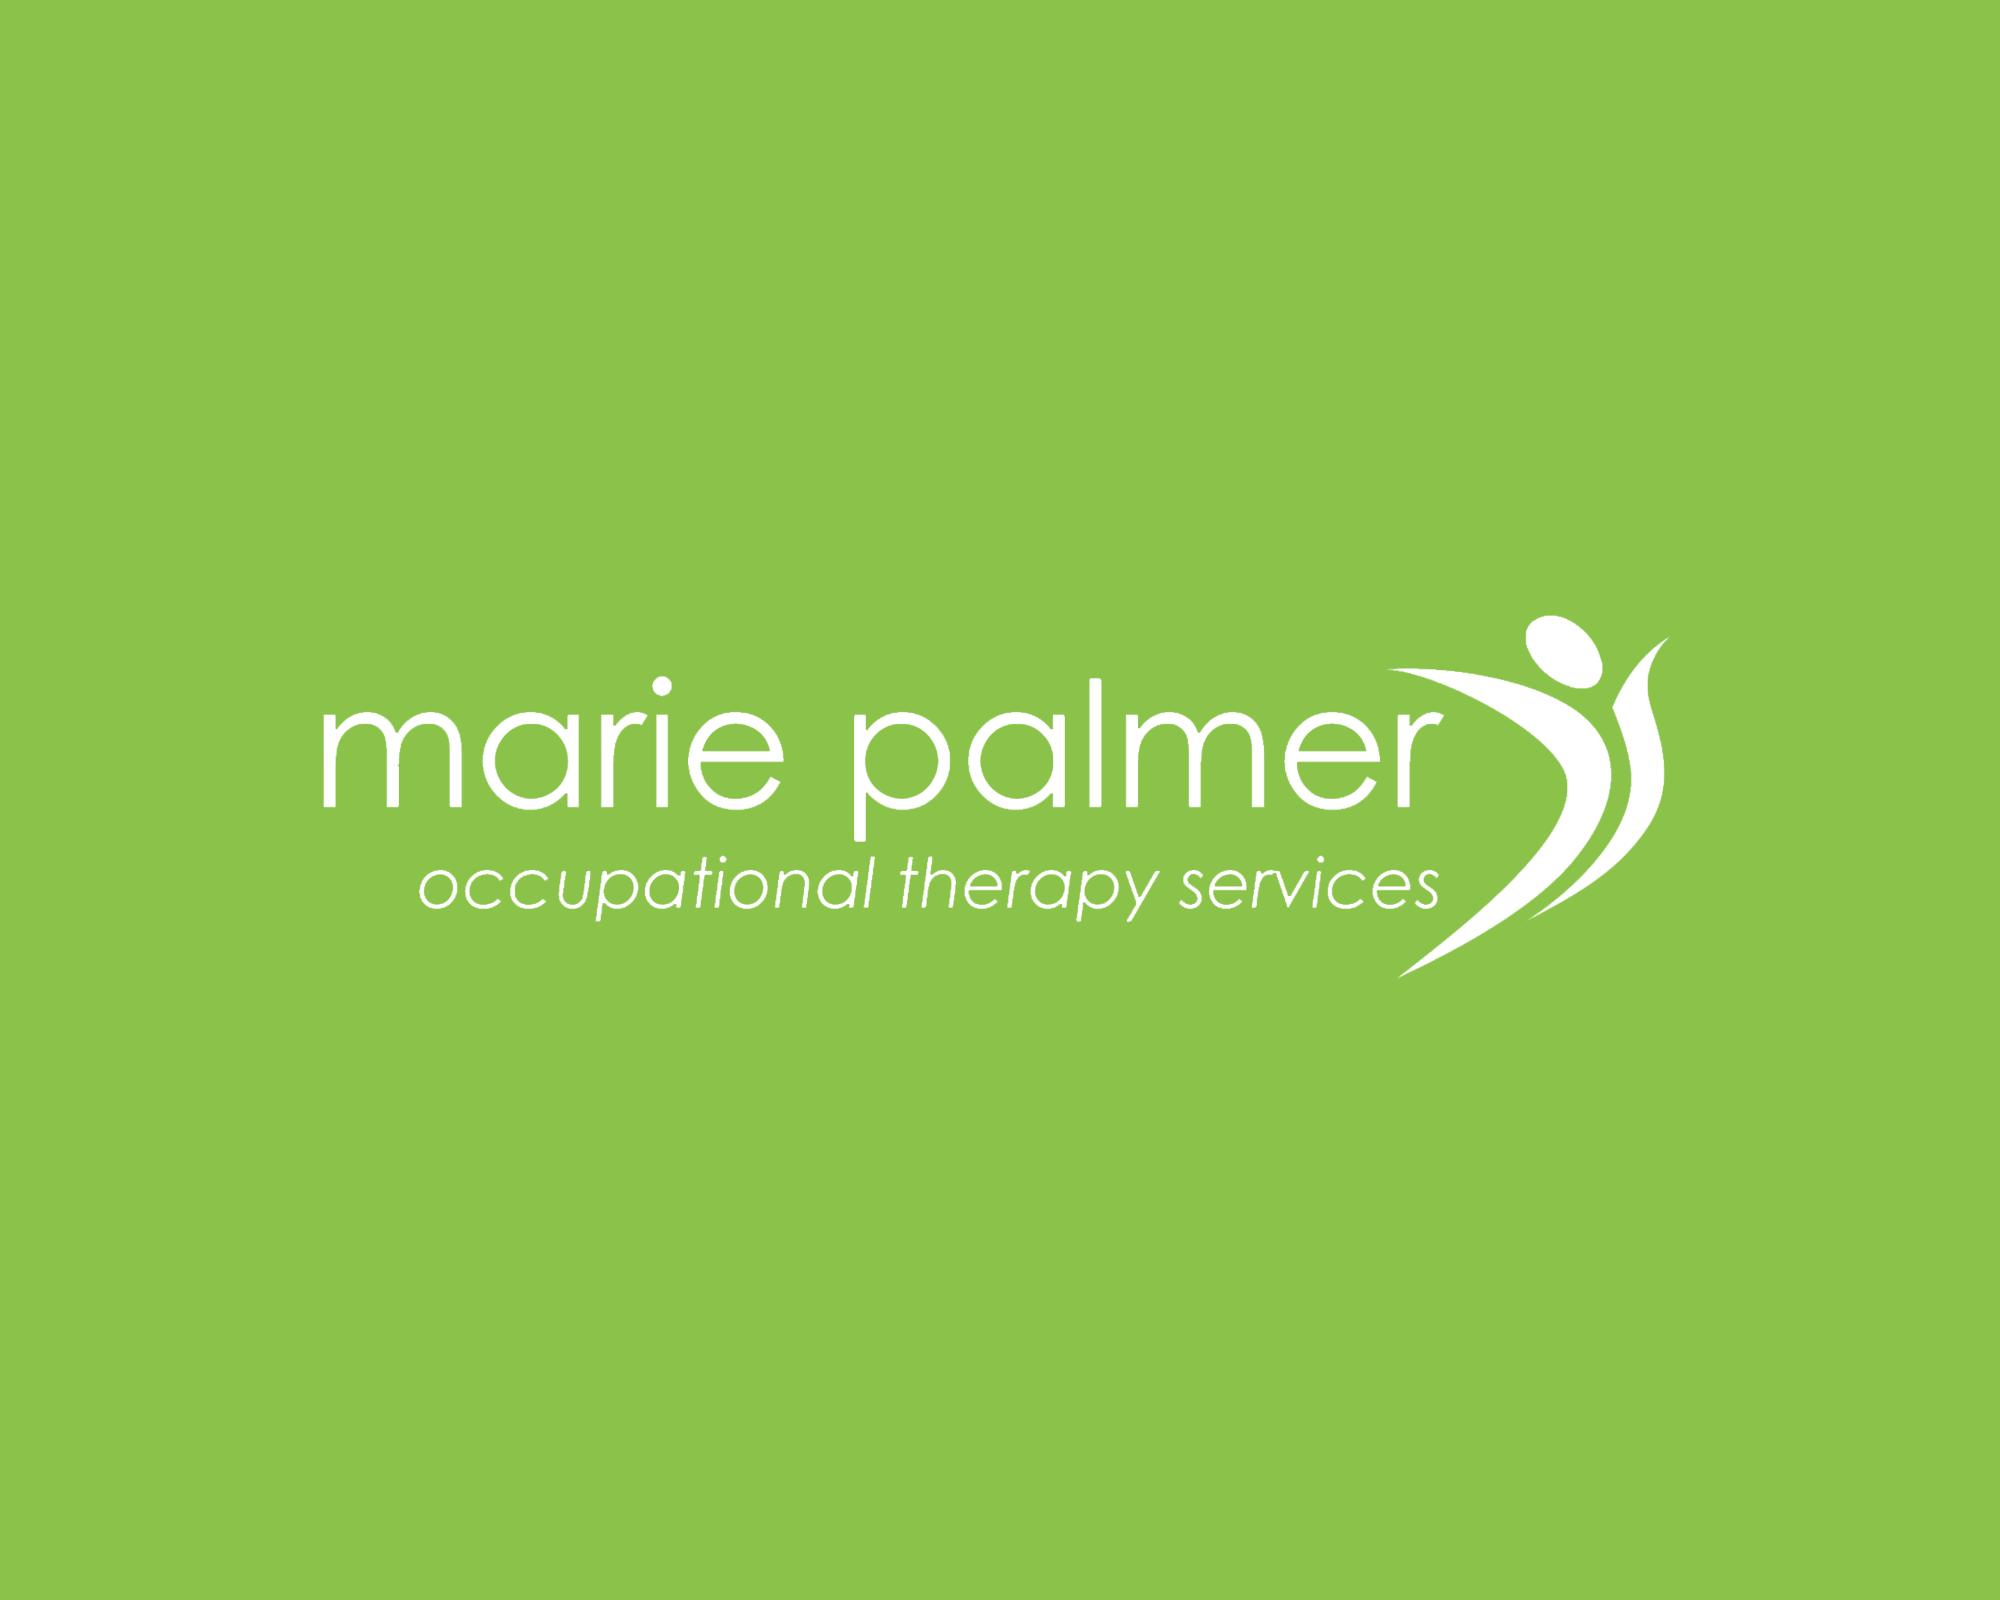 marie palmer Logo